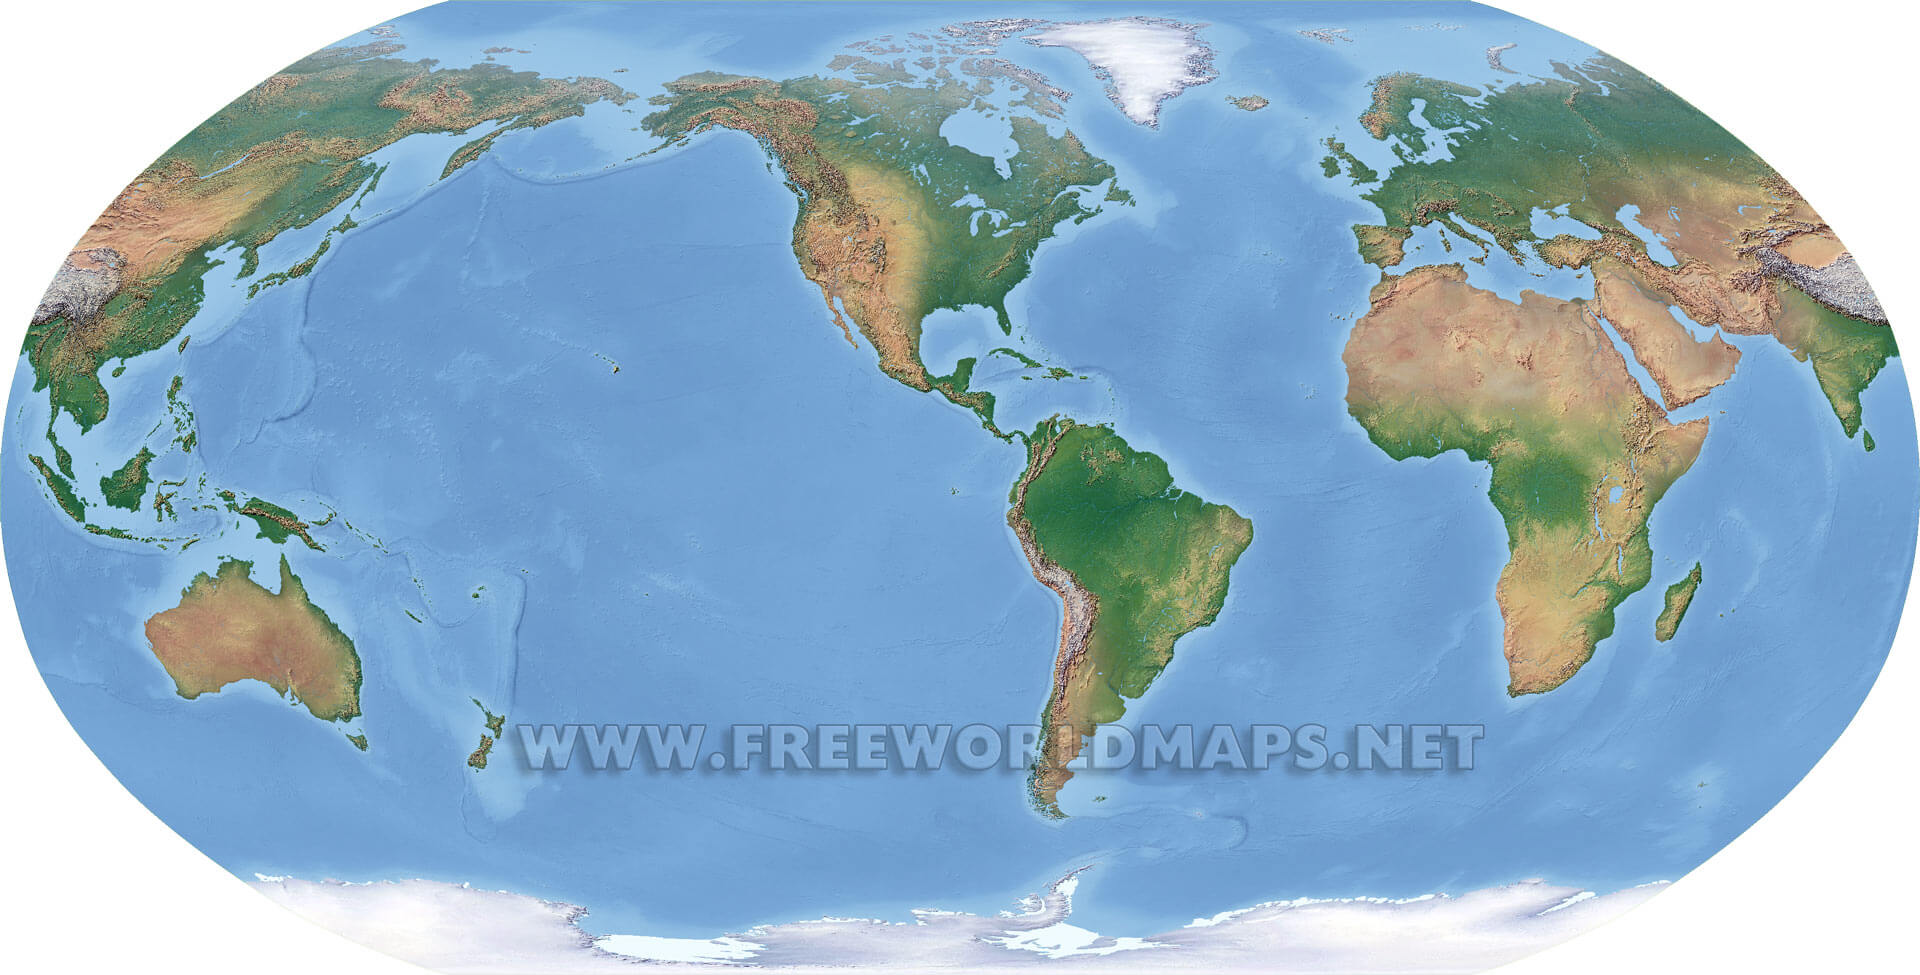 Mapa Del Mundo Paises Hd.Atlas Del Mundo Freeworldmaps Net